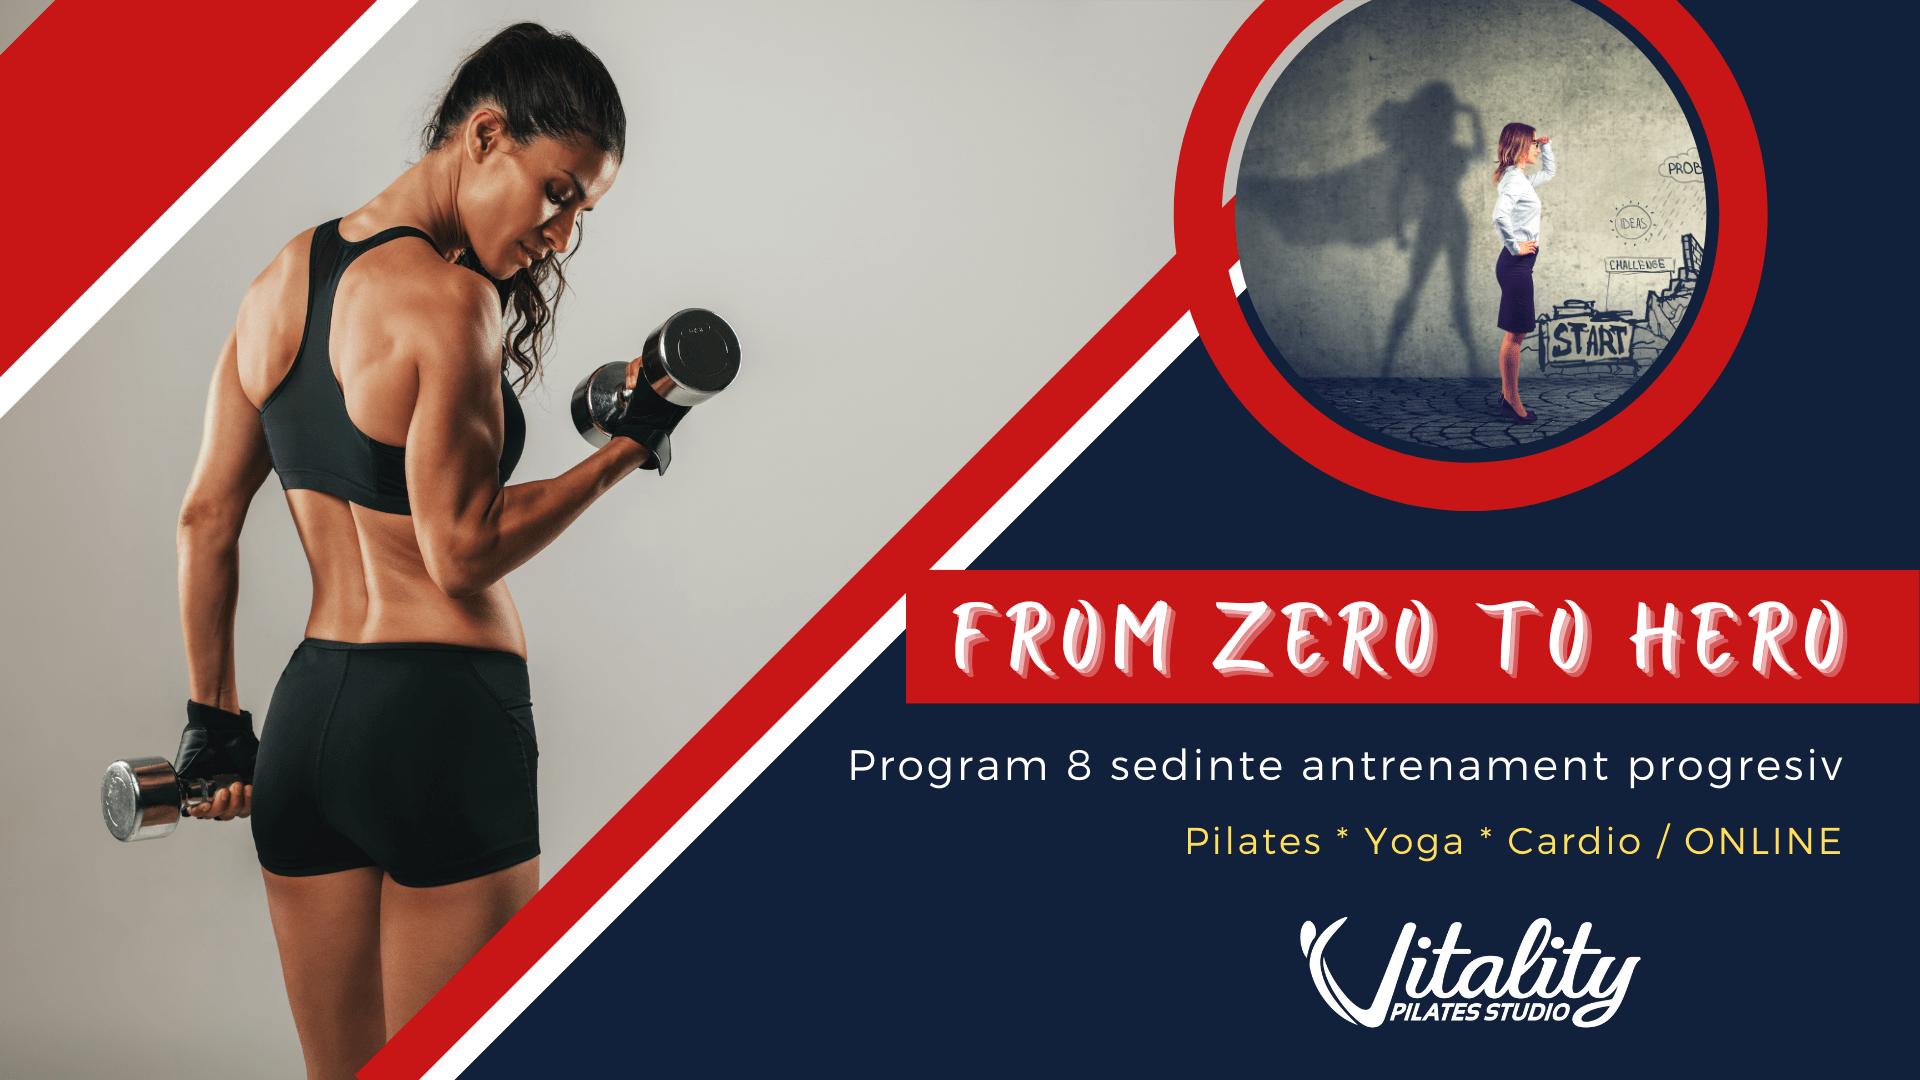 antrenament progresiv yoga pilates fitness